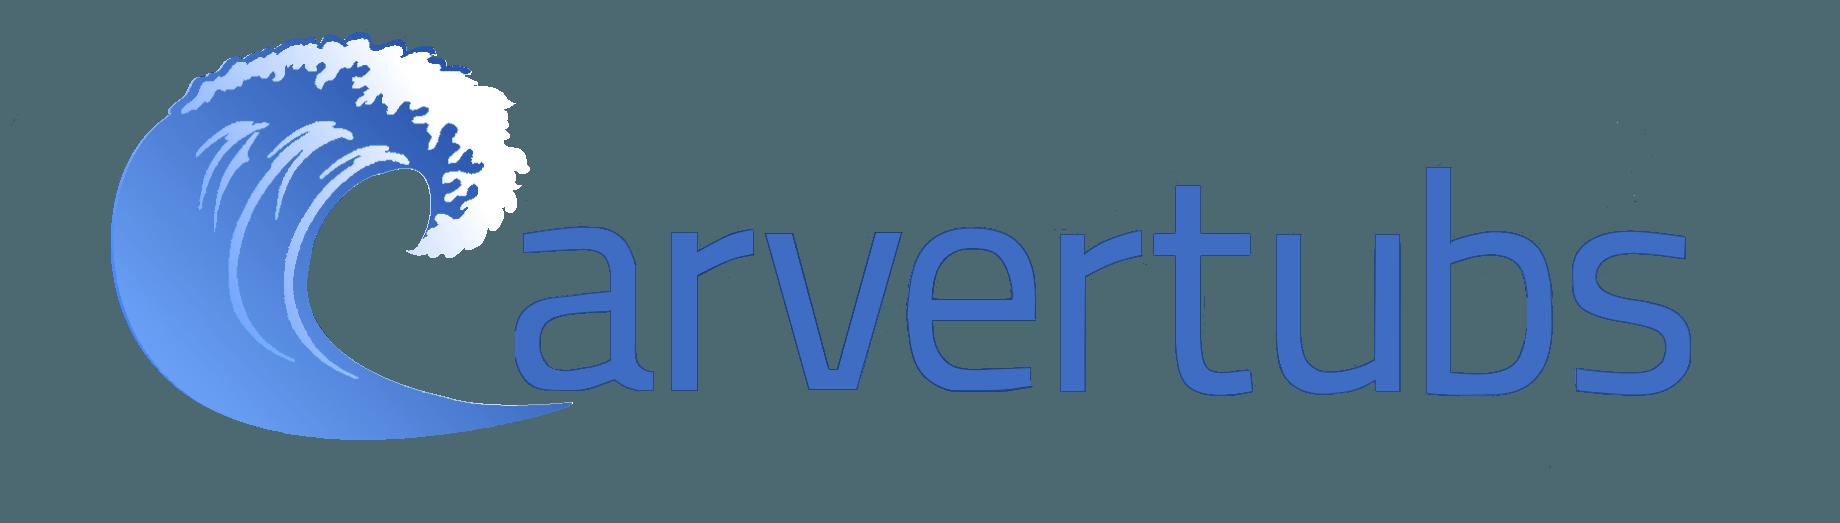 Homepages - Carver Tubs